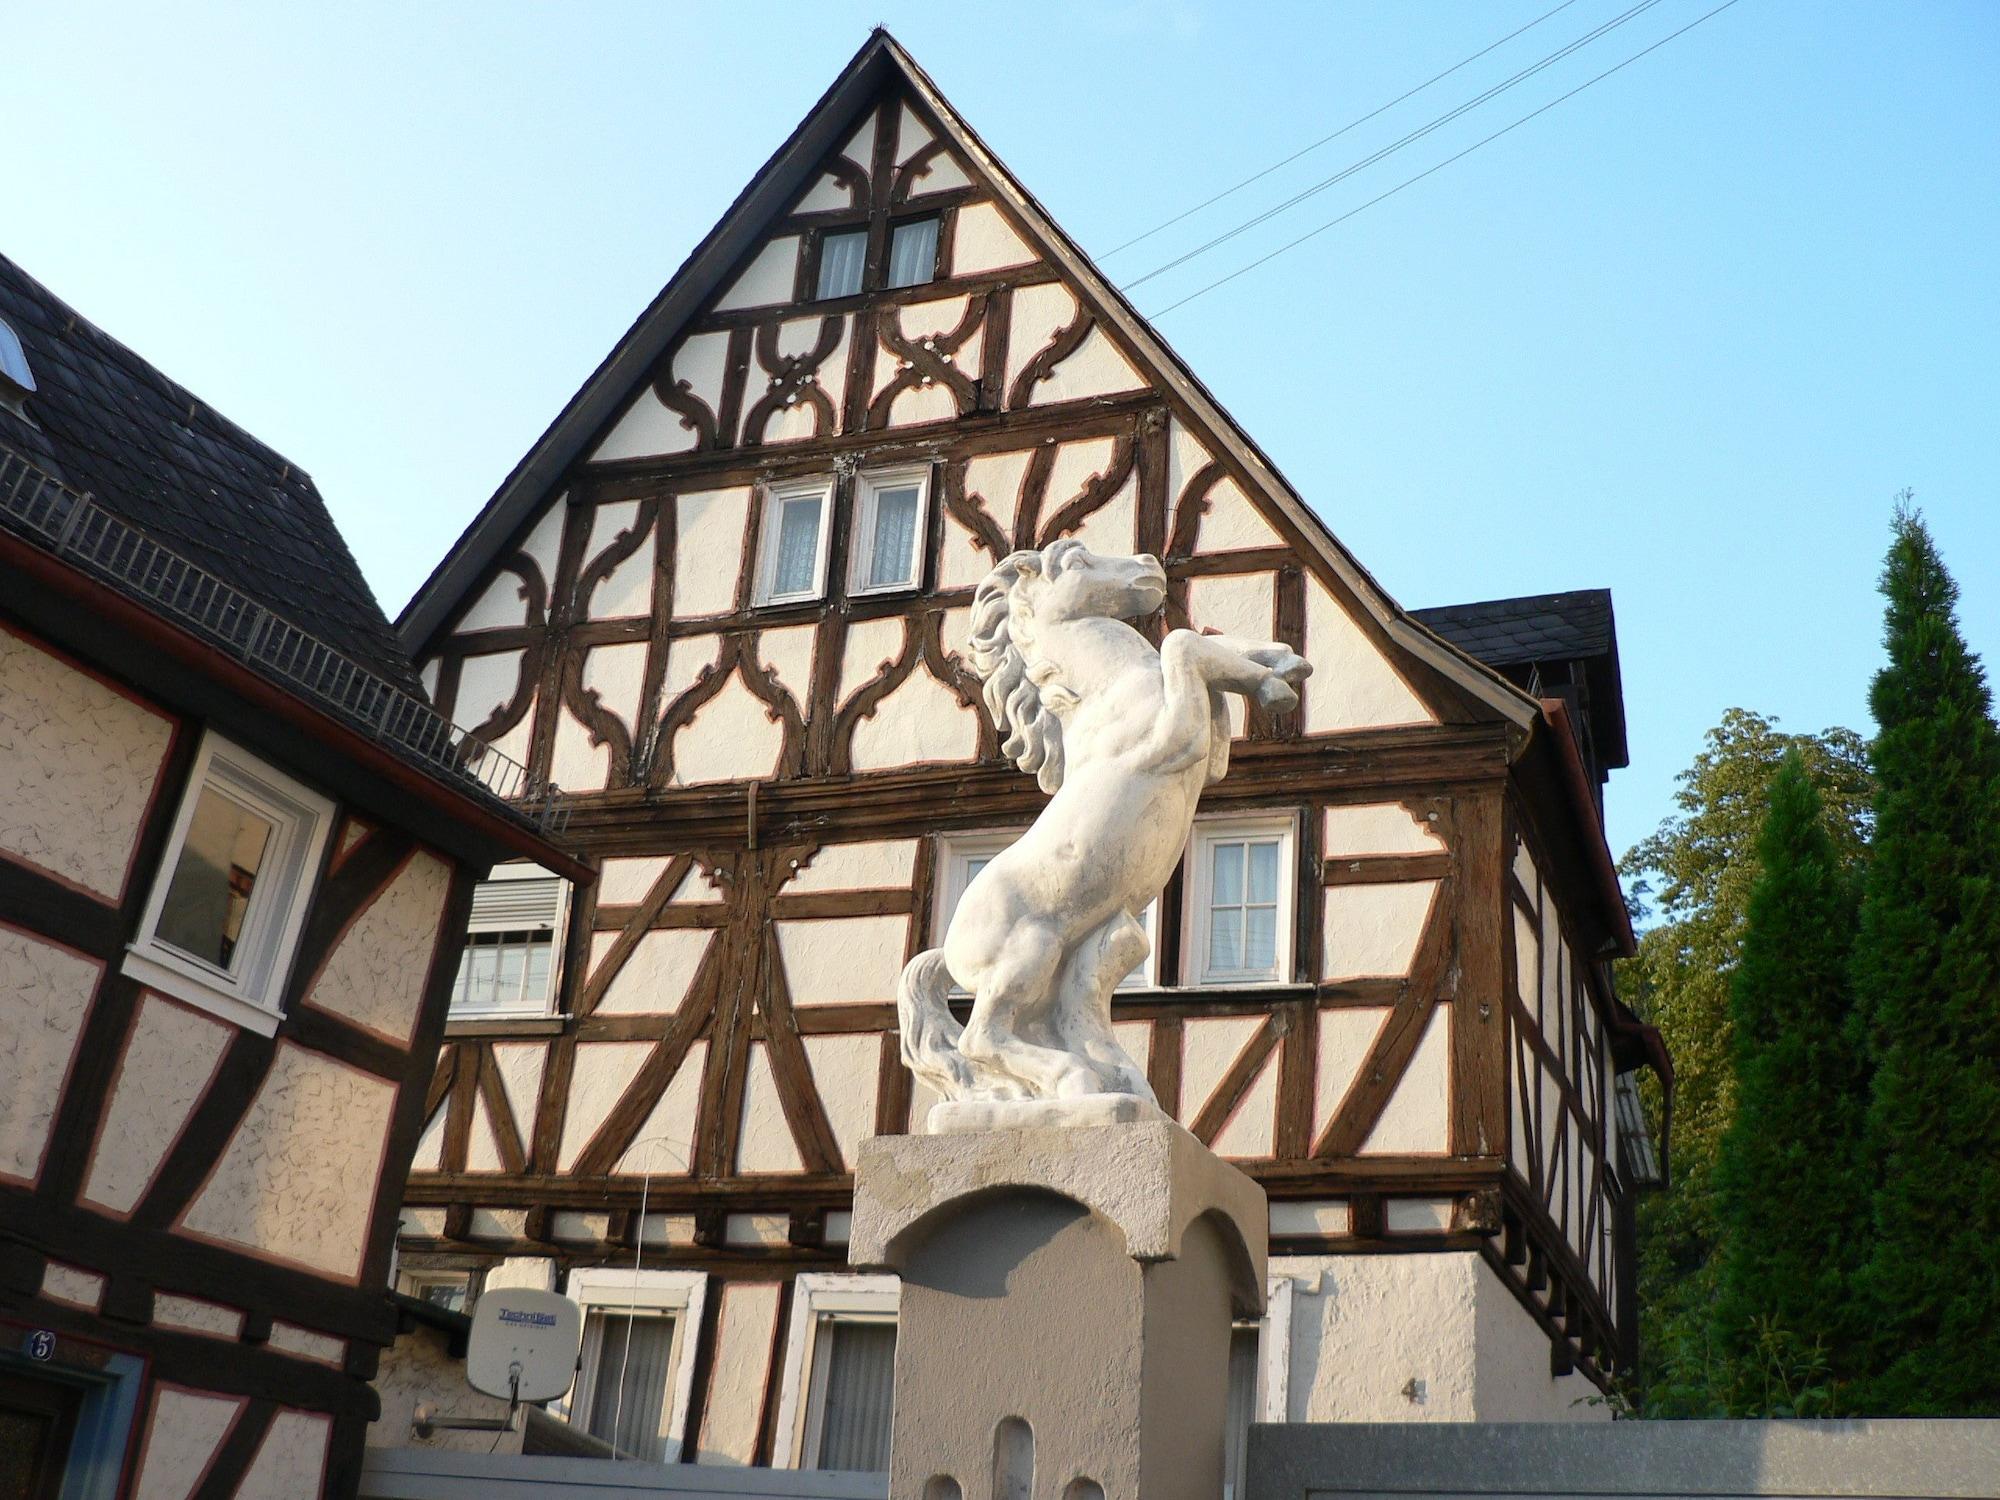 Gästehaus CHEVAL BLANC, Rheingau-Taunus-Kreis